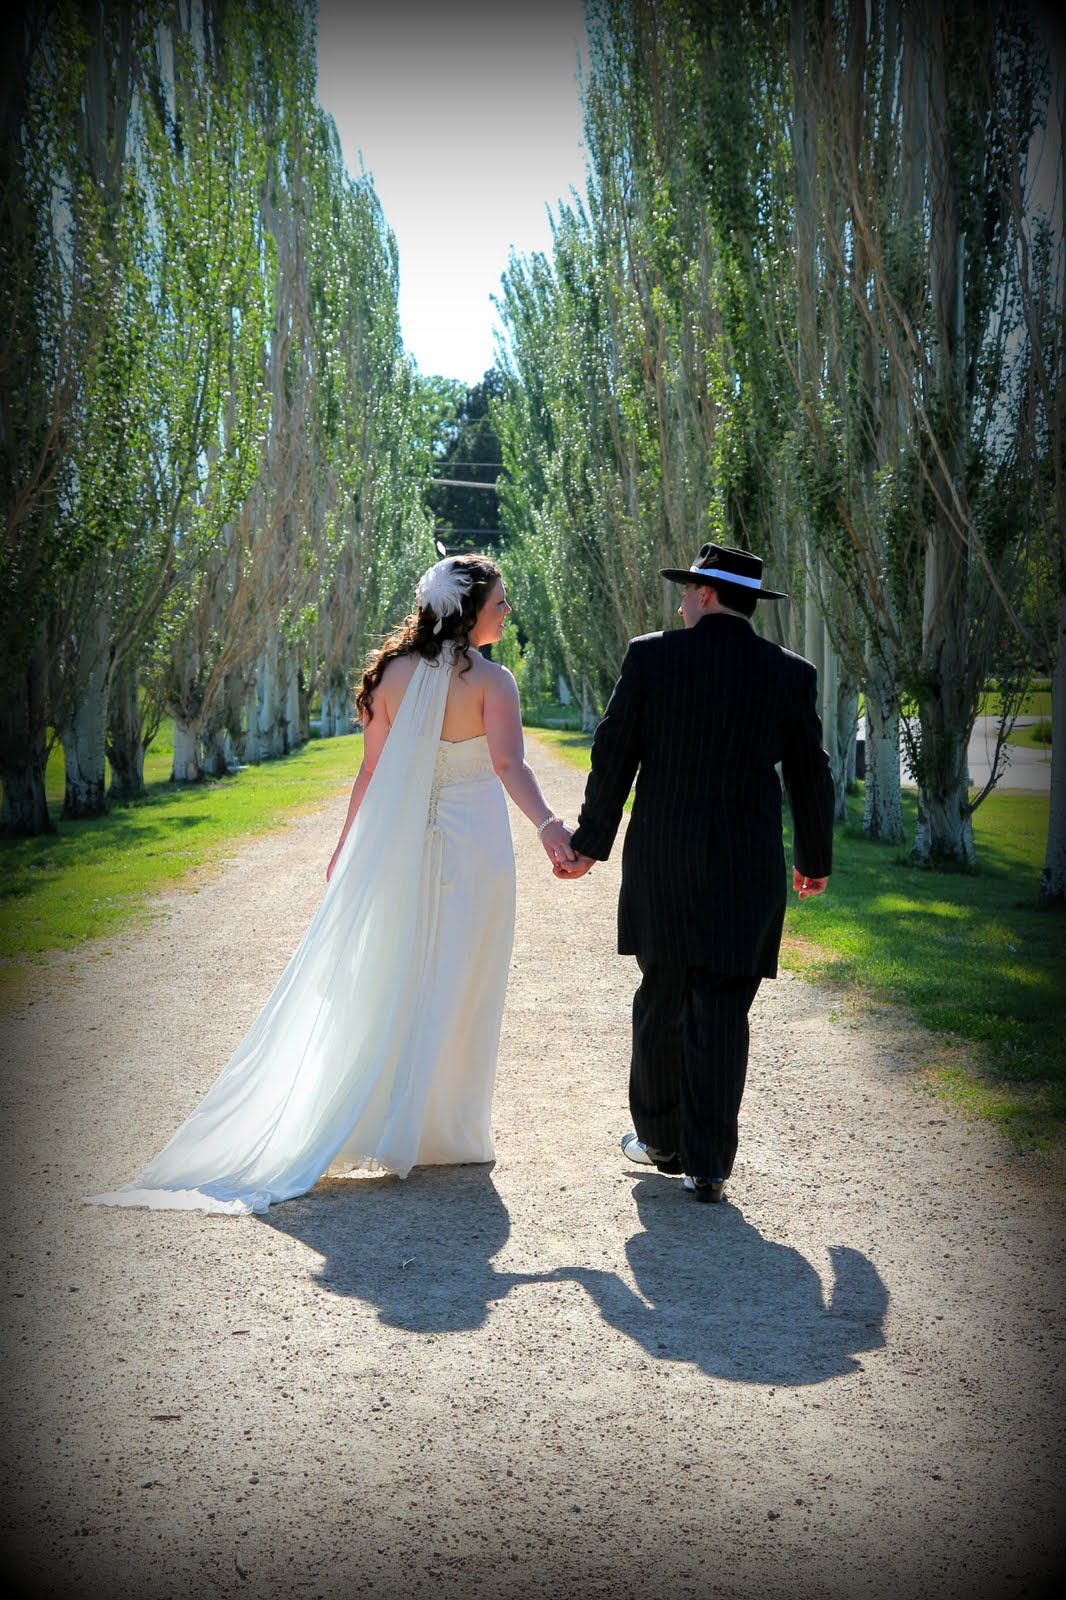 Spanish Fork Photography, CheapShots! Family and Wedding ...